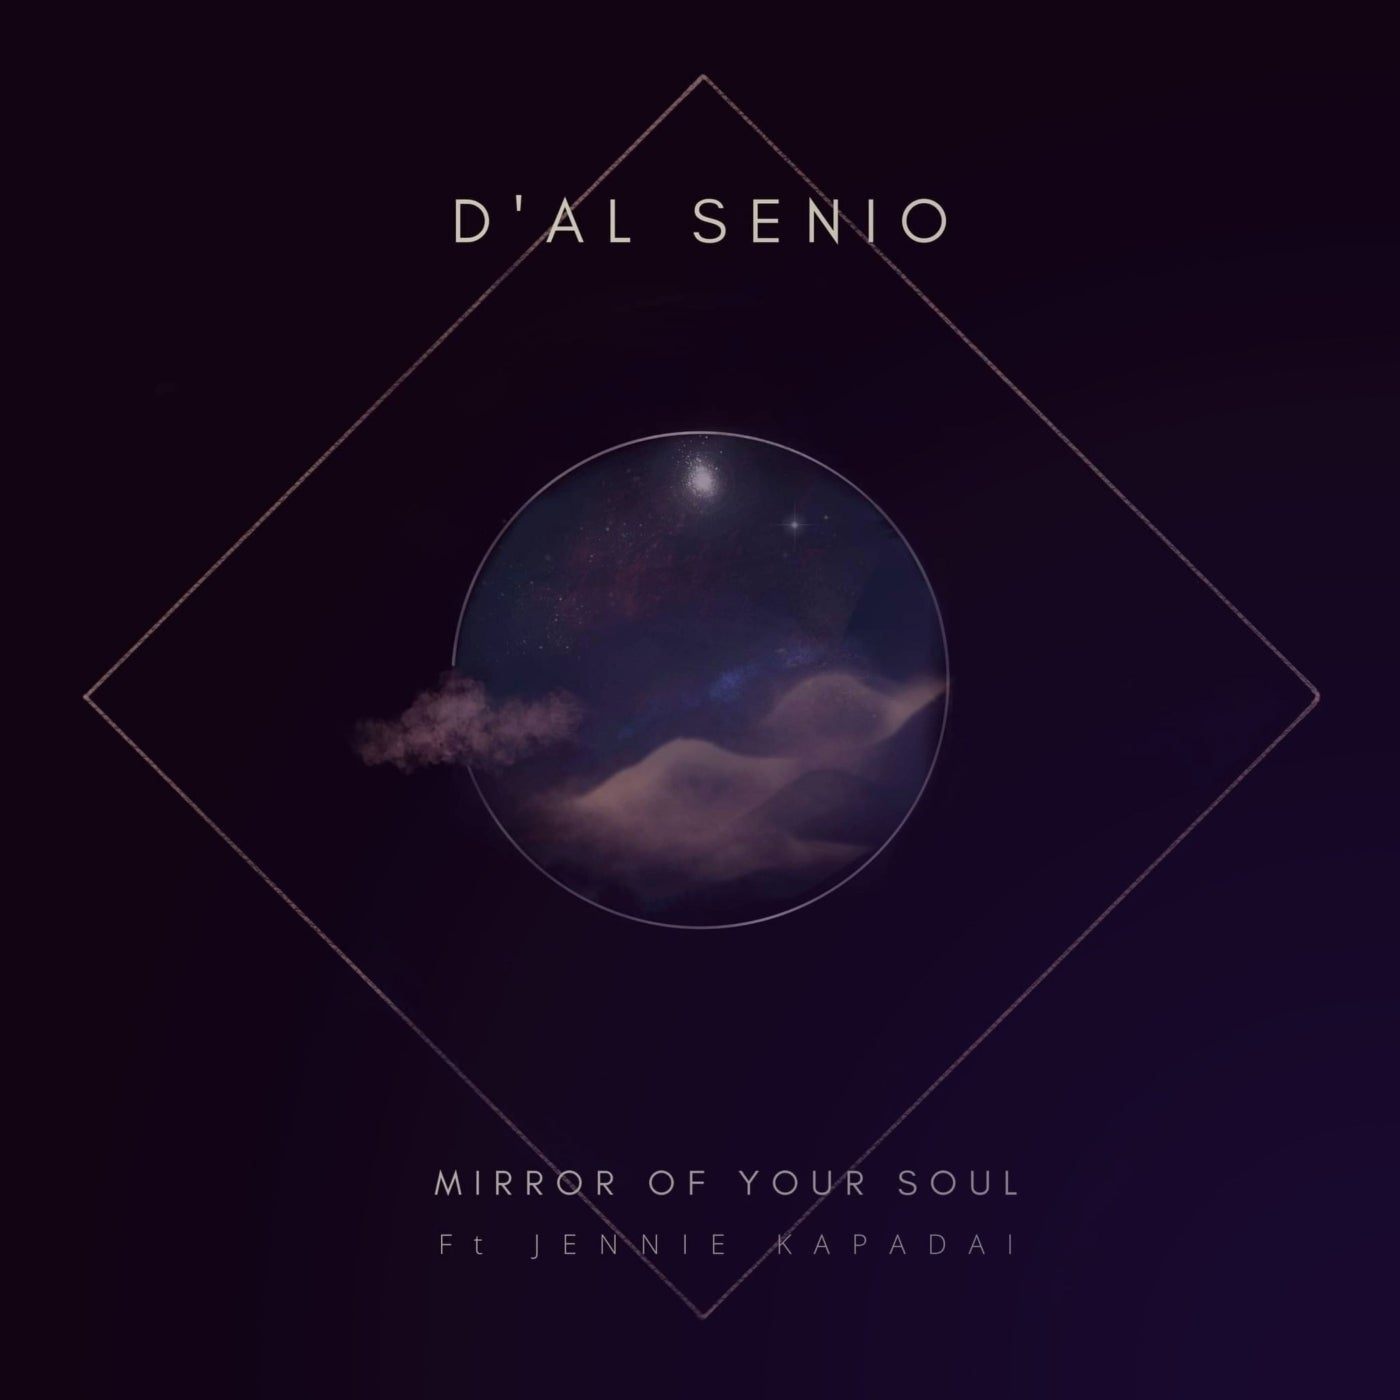 Mirror of Your Soul feat. Jennie Kapadai (Original Mix)